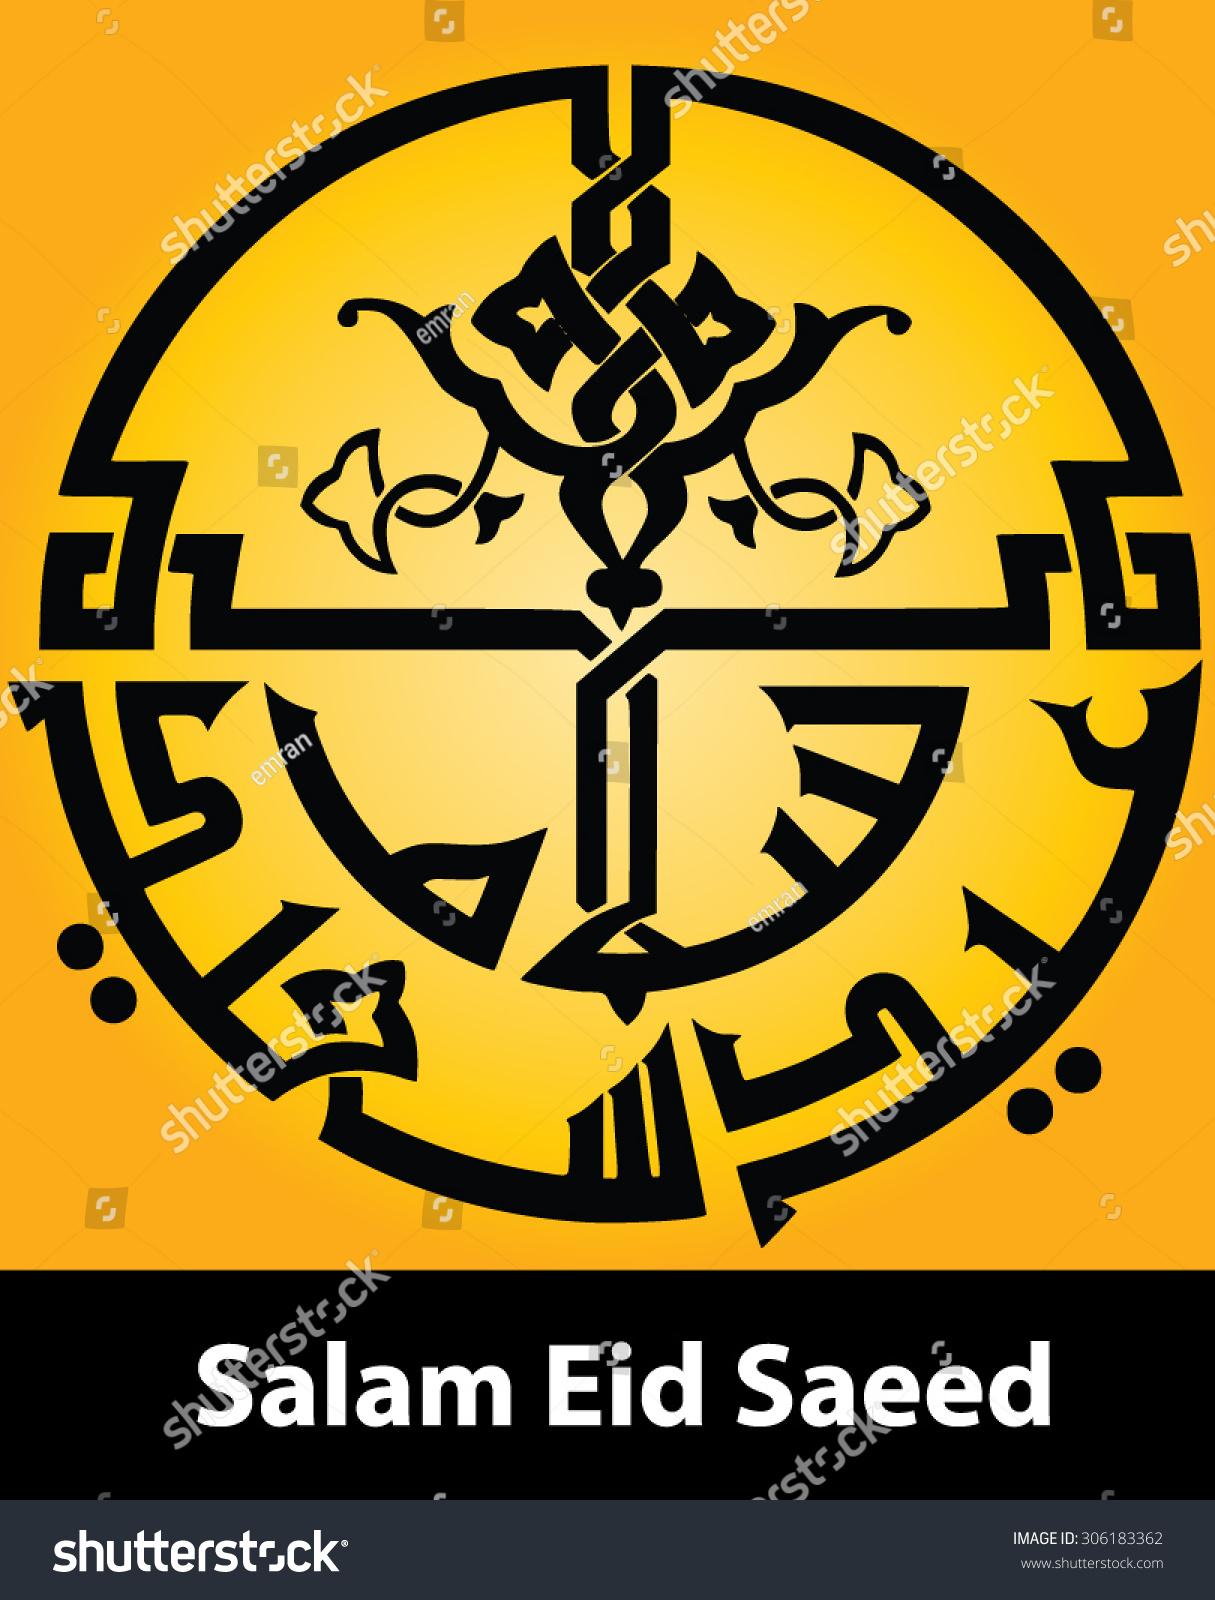 Vectors Arabic Phrase Salam Eid Saeed Stock Vector Royalty Free